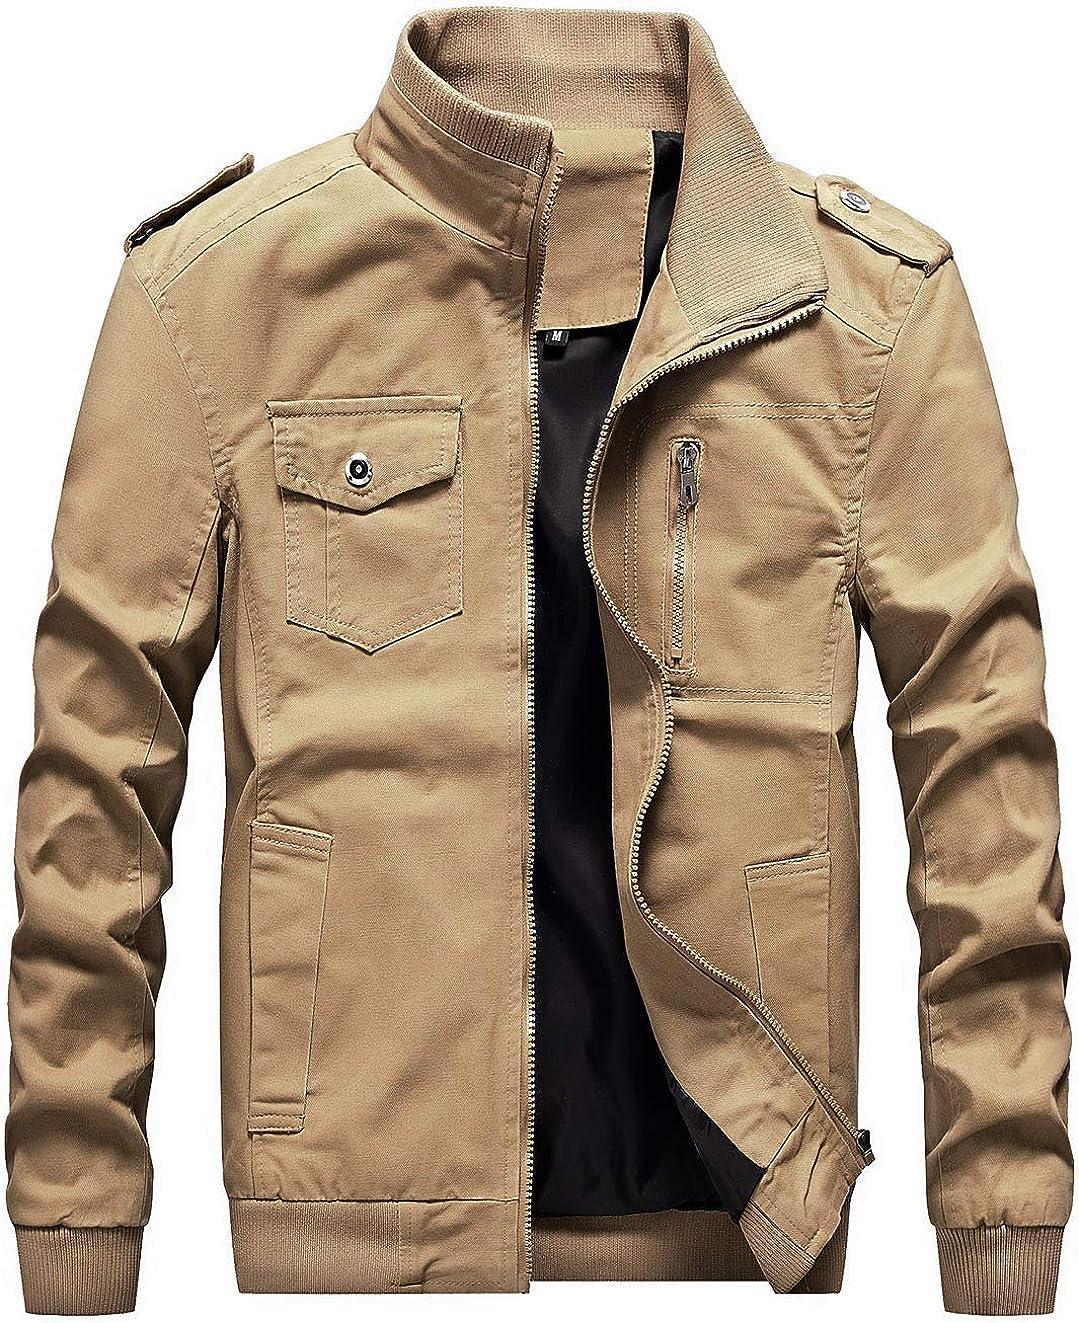 chouyatou 新作販売 Men's Casual Stand Collar Zip-Up Bomber 世界の人気ブランド Ja Lightweight